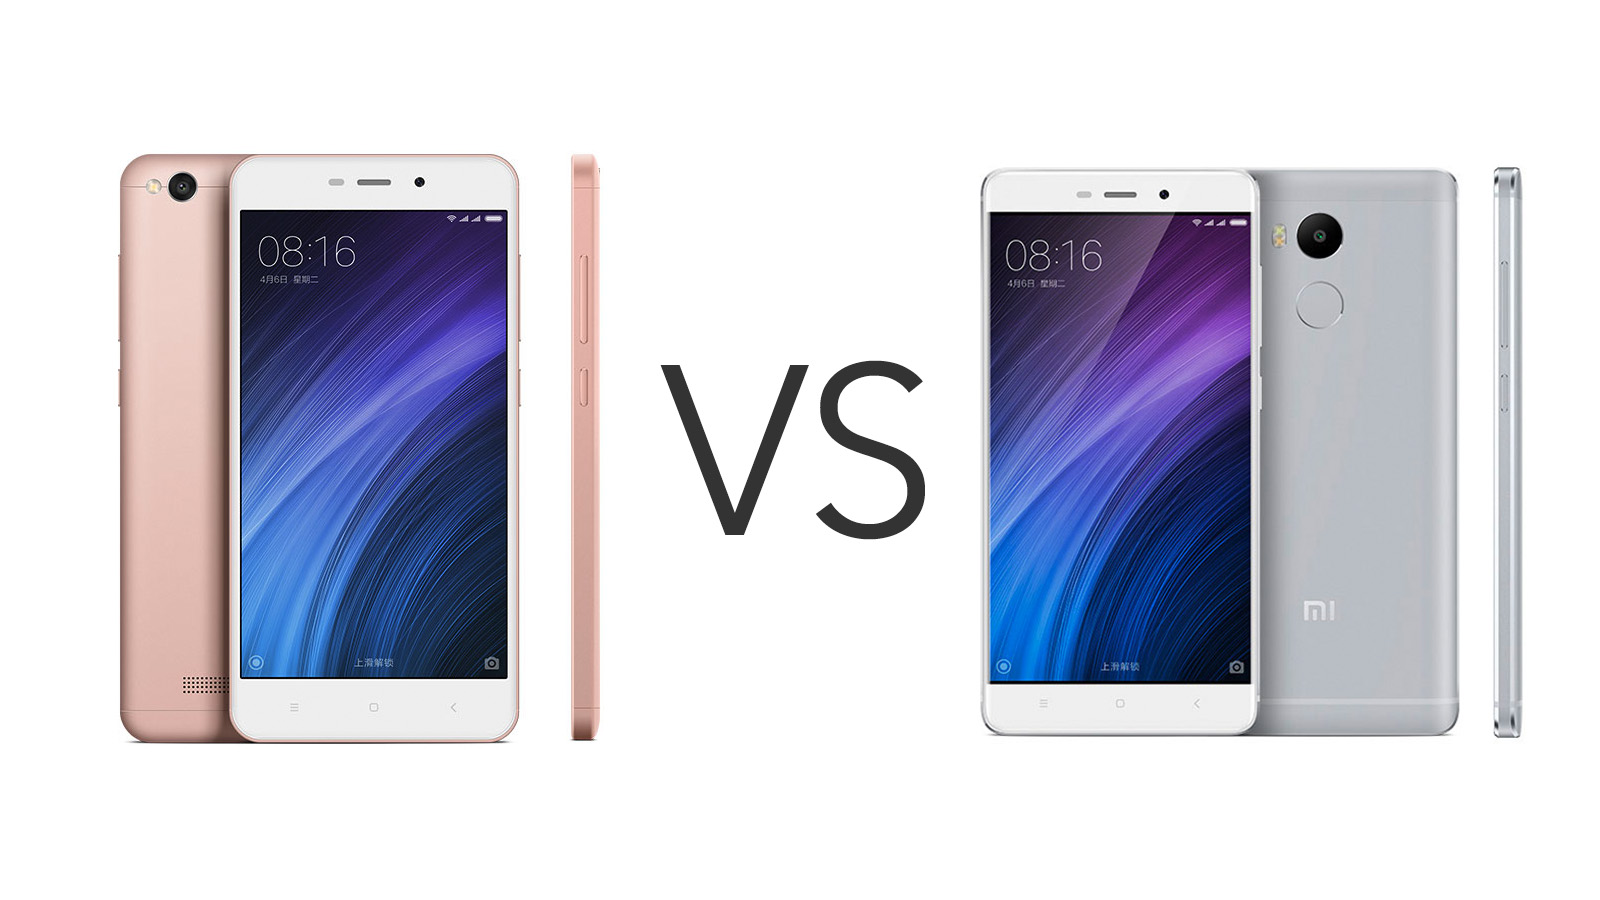 Xiaomi Redmi 4 vs 4A